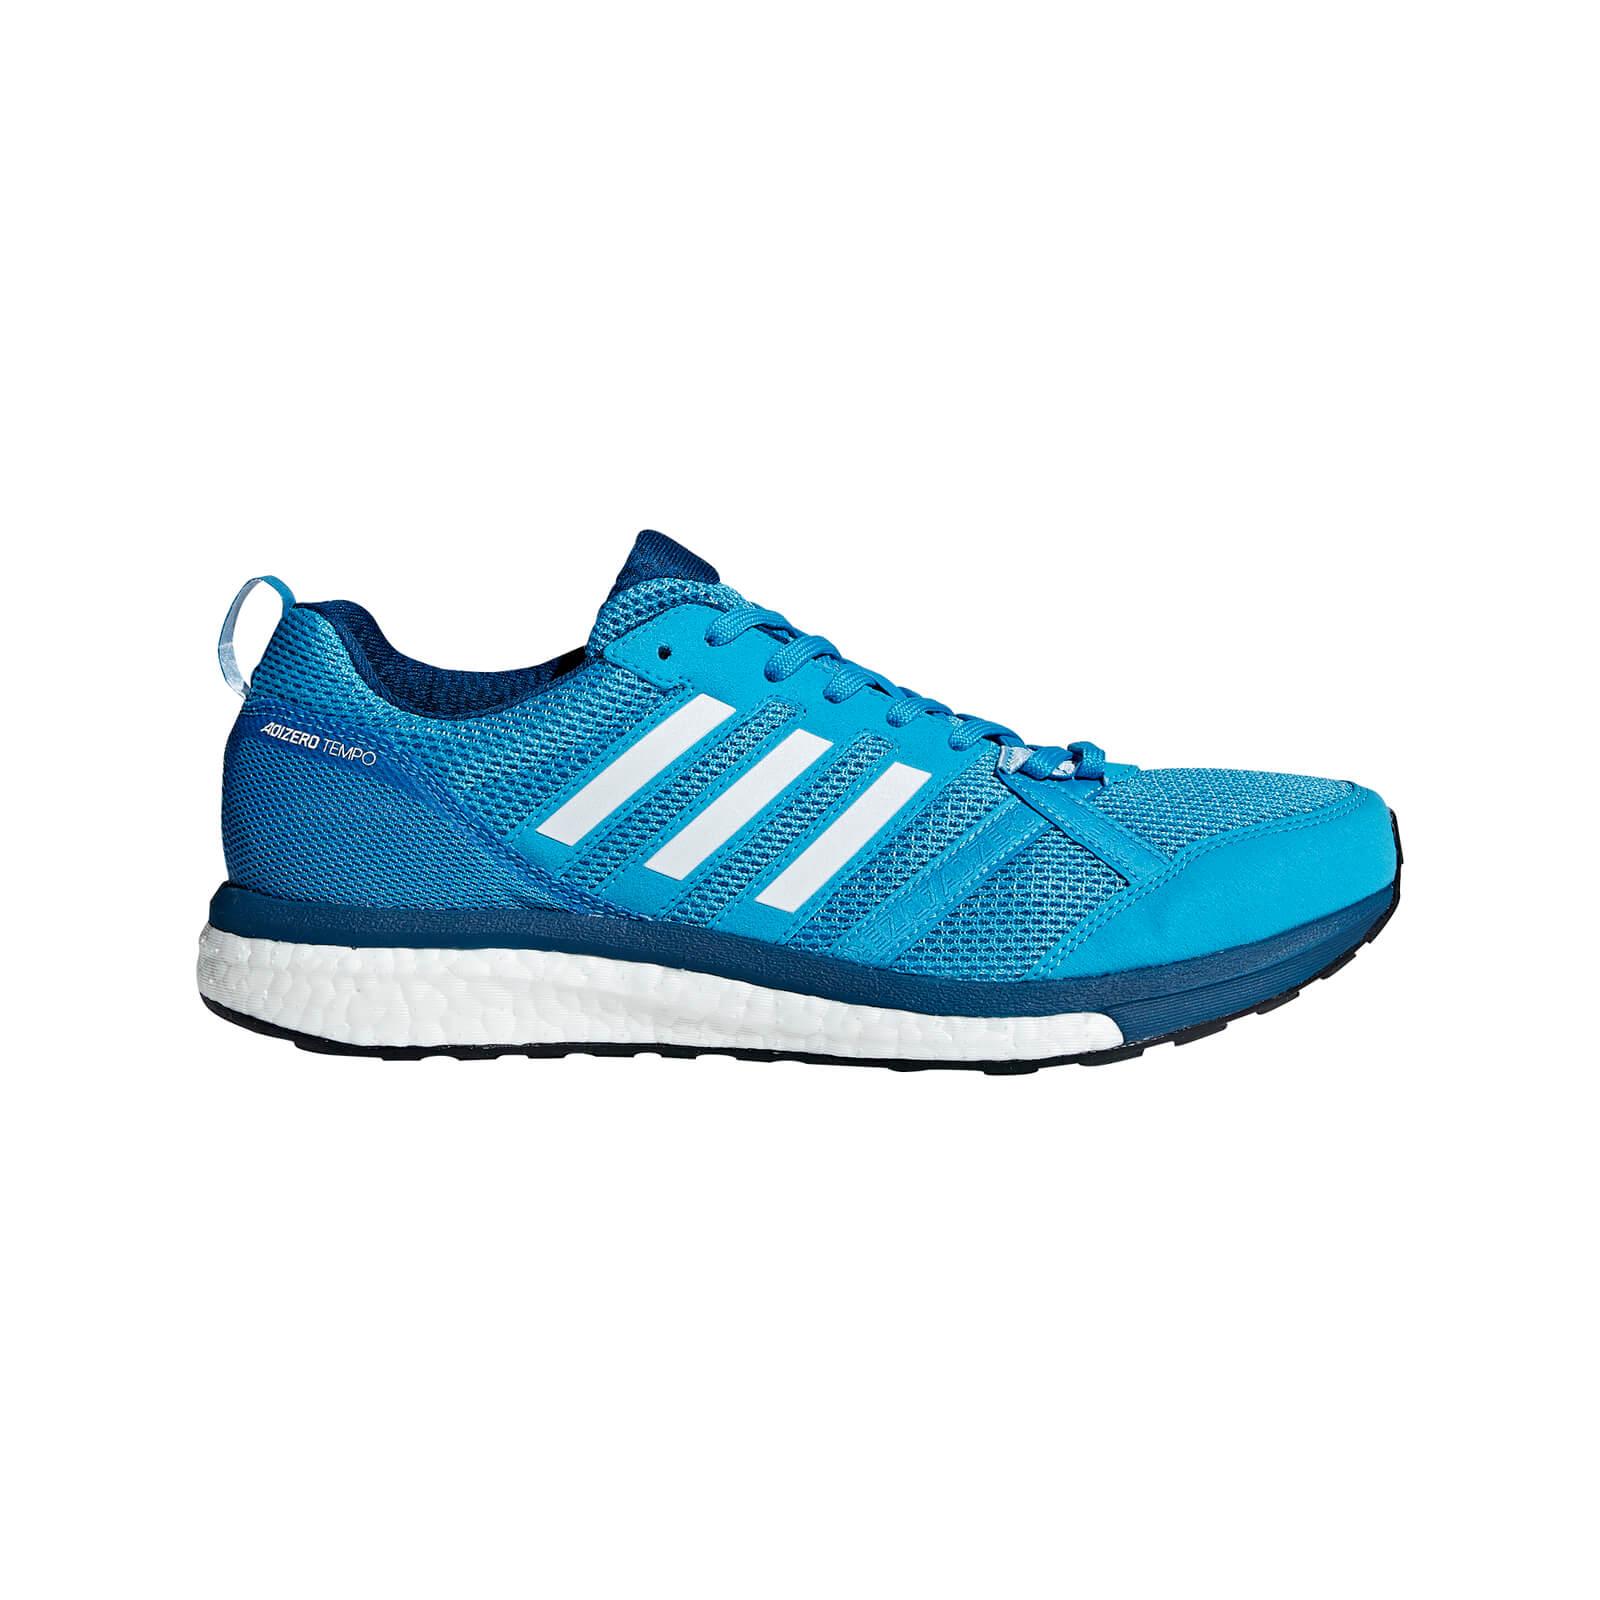 adidas Men's Adizero Tempo 9 Running Shoes - Blue - US 10.5/UK 10 - Blue